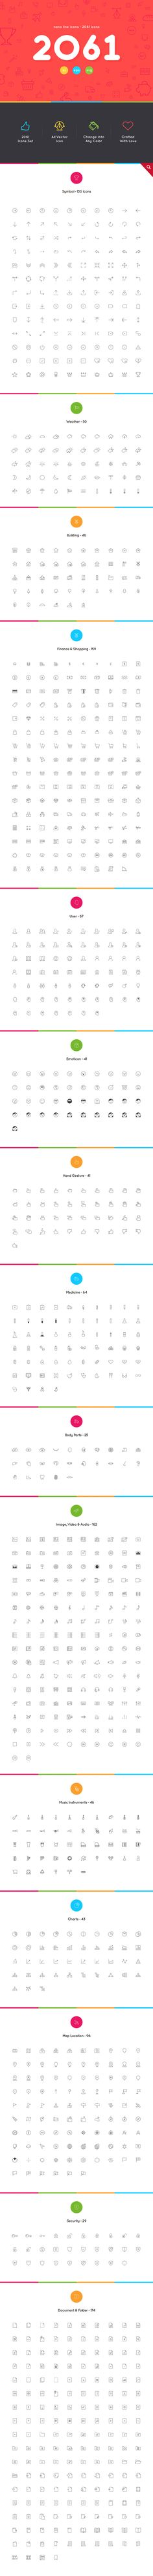 Download here: https://creativemarket.com/vuuuds/261615-2061-Nanoline-icons